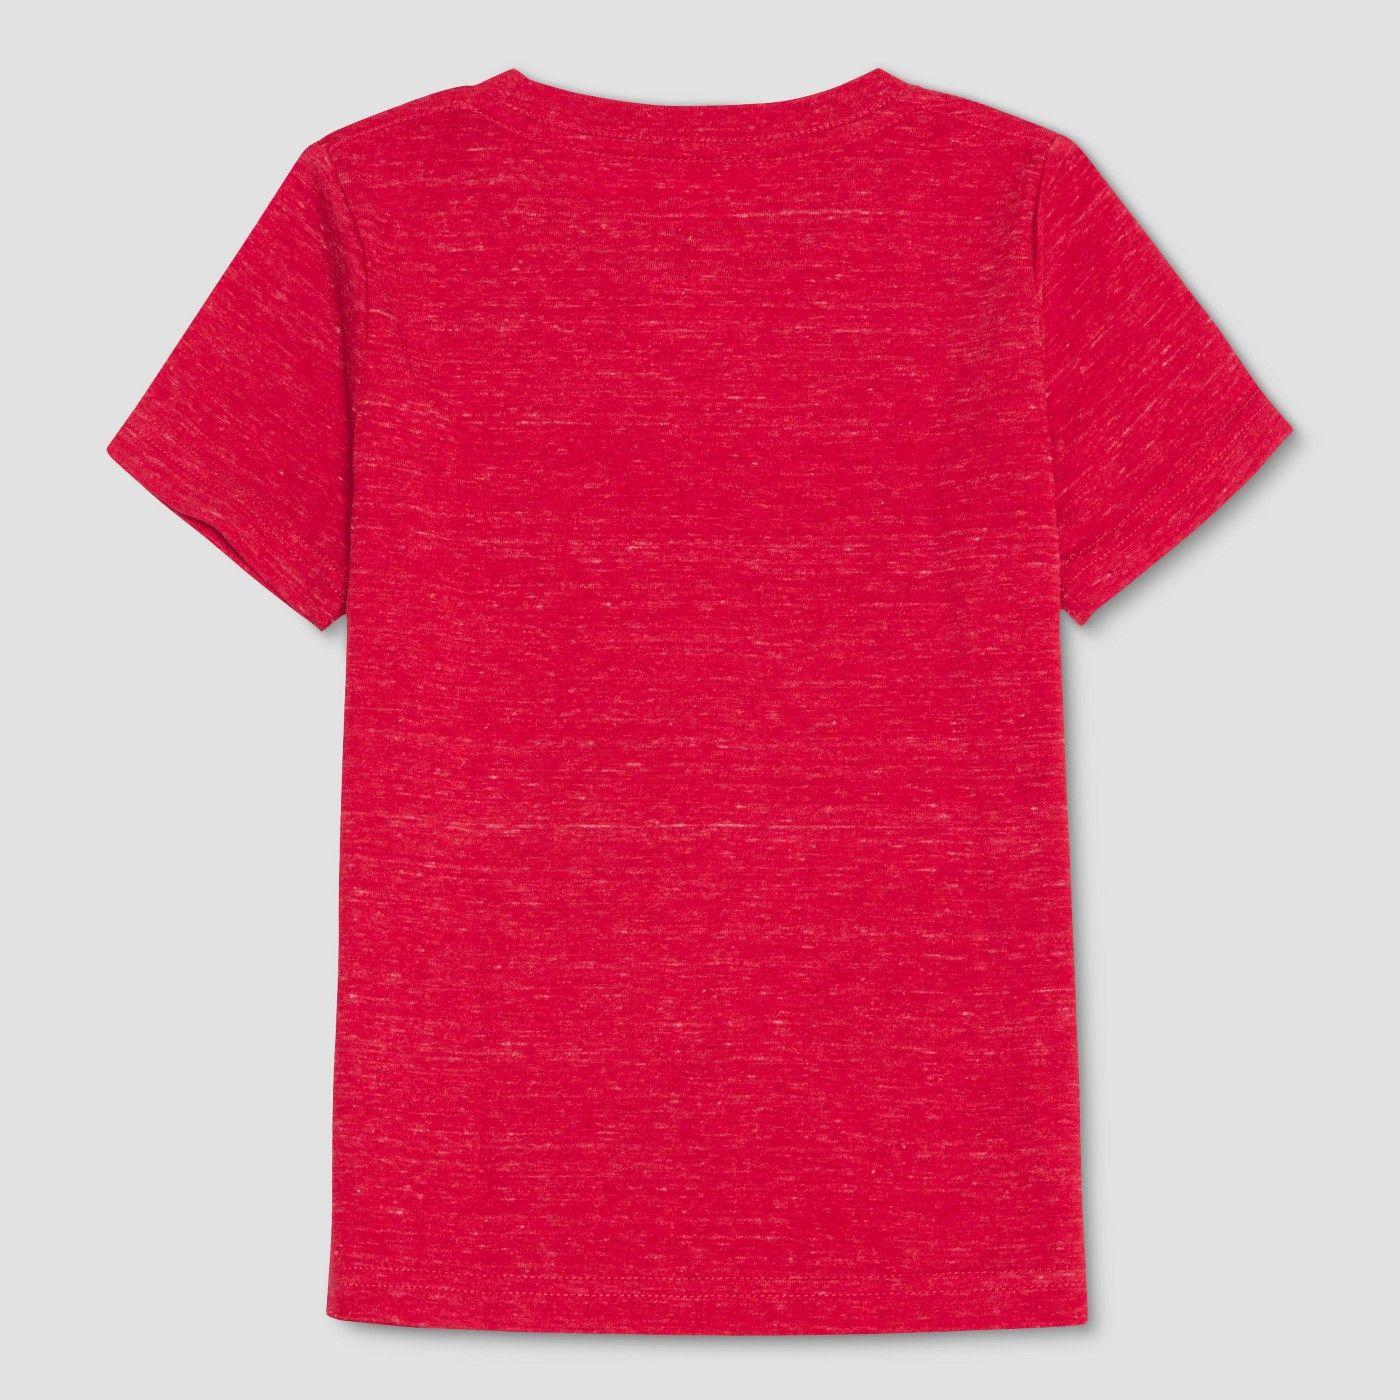 e19532d31 Toddler Boys  PAW Patrol Short Sleeve T-Shirt - Red 2T  PAW